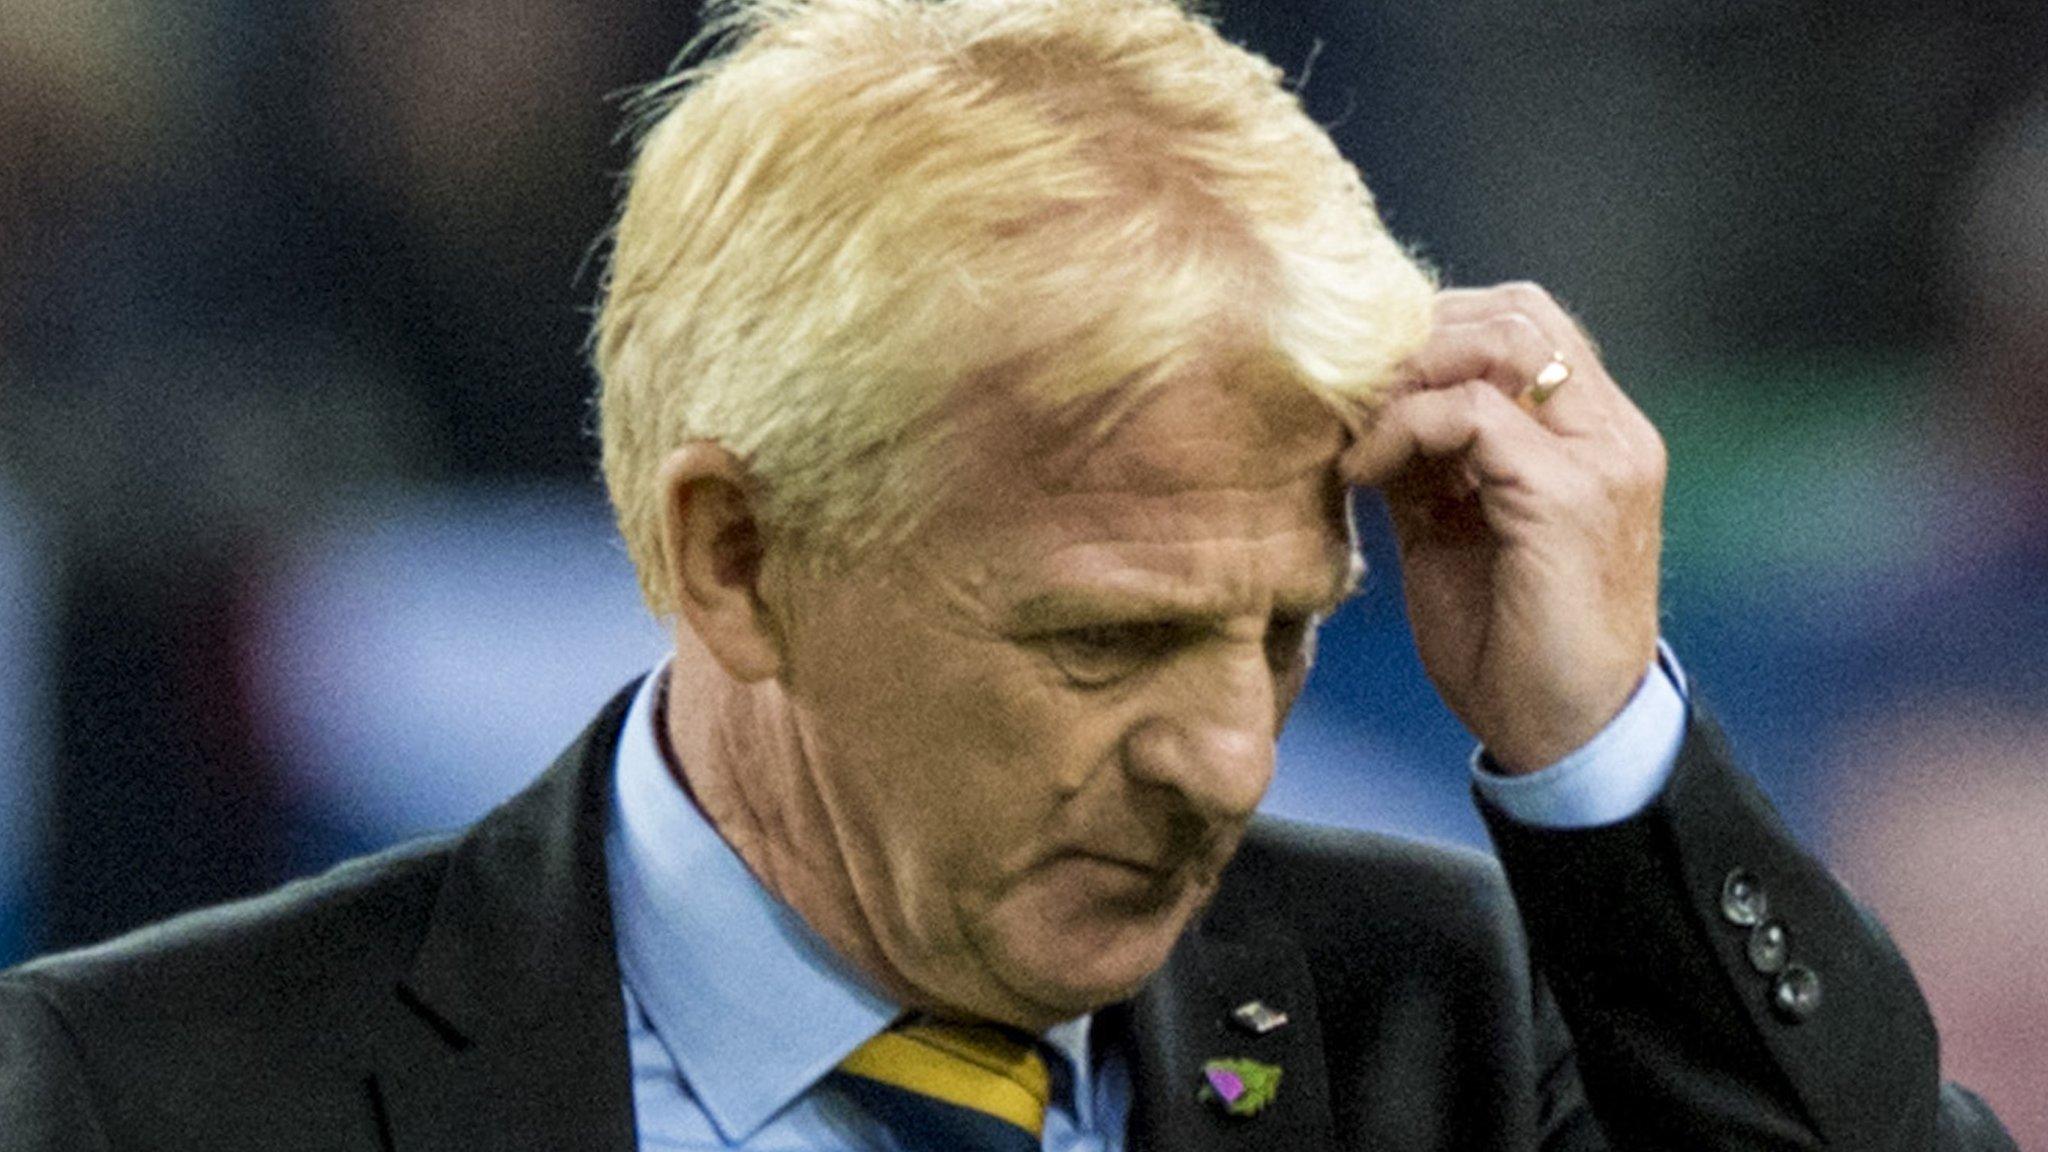 'Yob behaviour' at football is 'nothing new' - Gordon Strachan